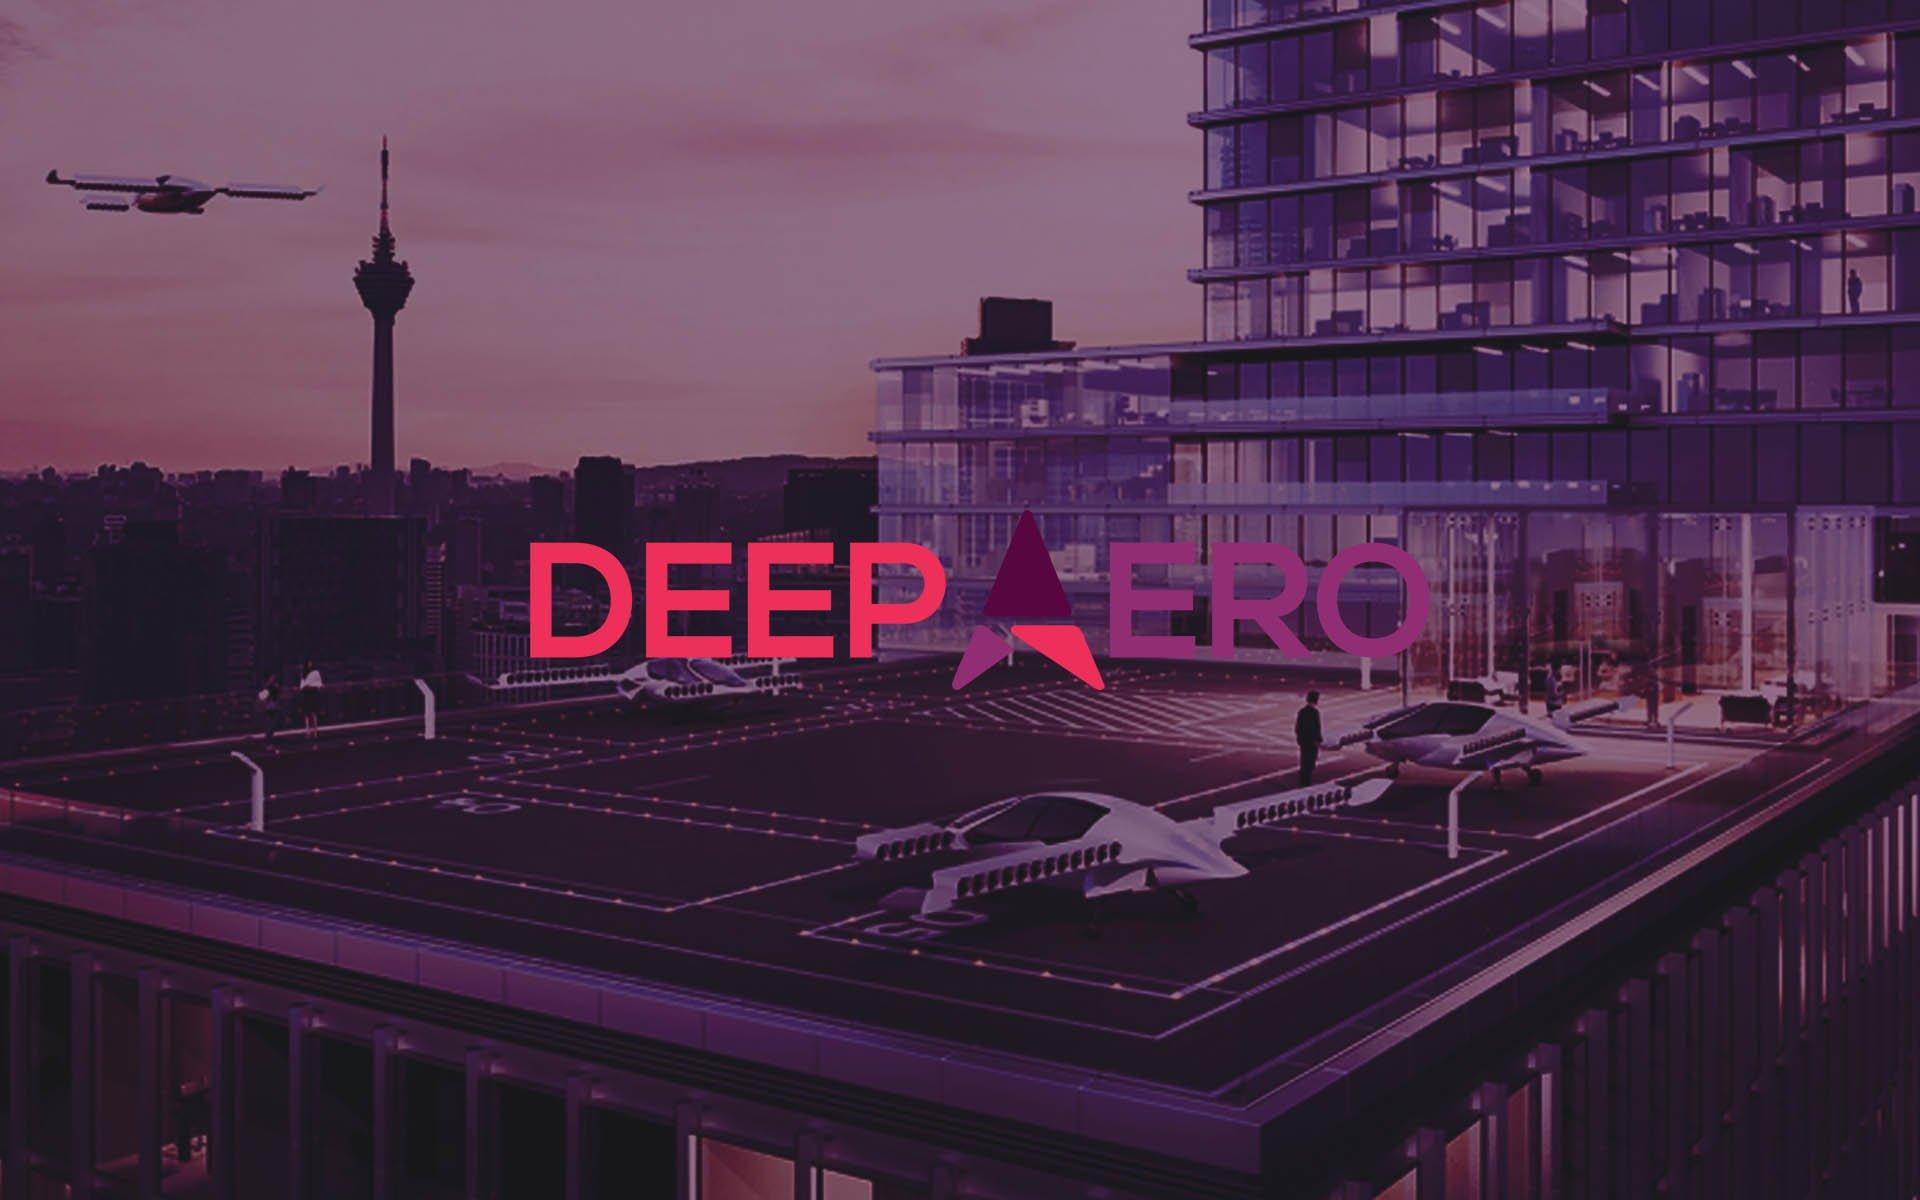 DEEP AERO (DRONE) Token will power the AI Driven Drone Economy on the Blockchain